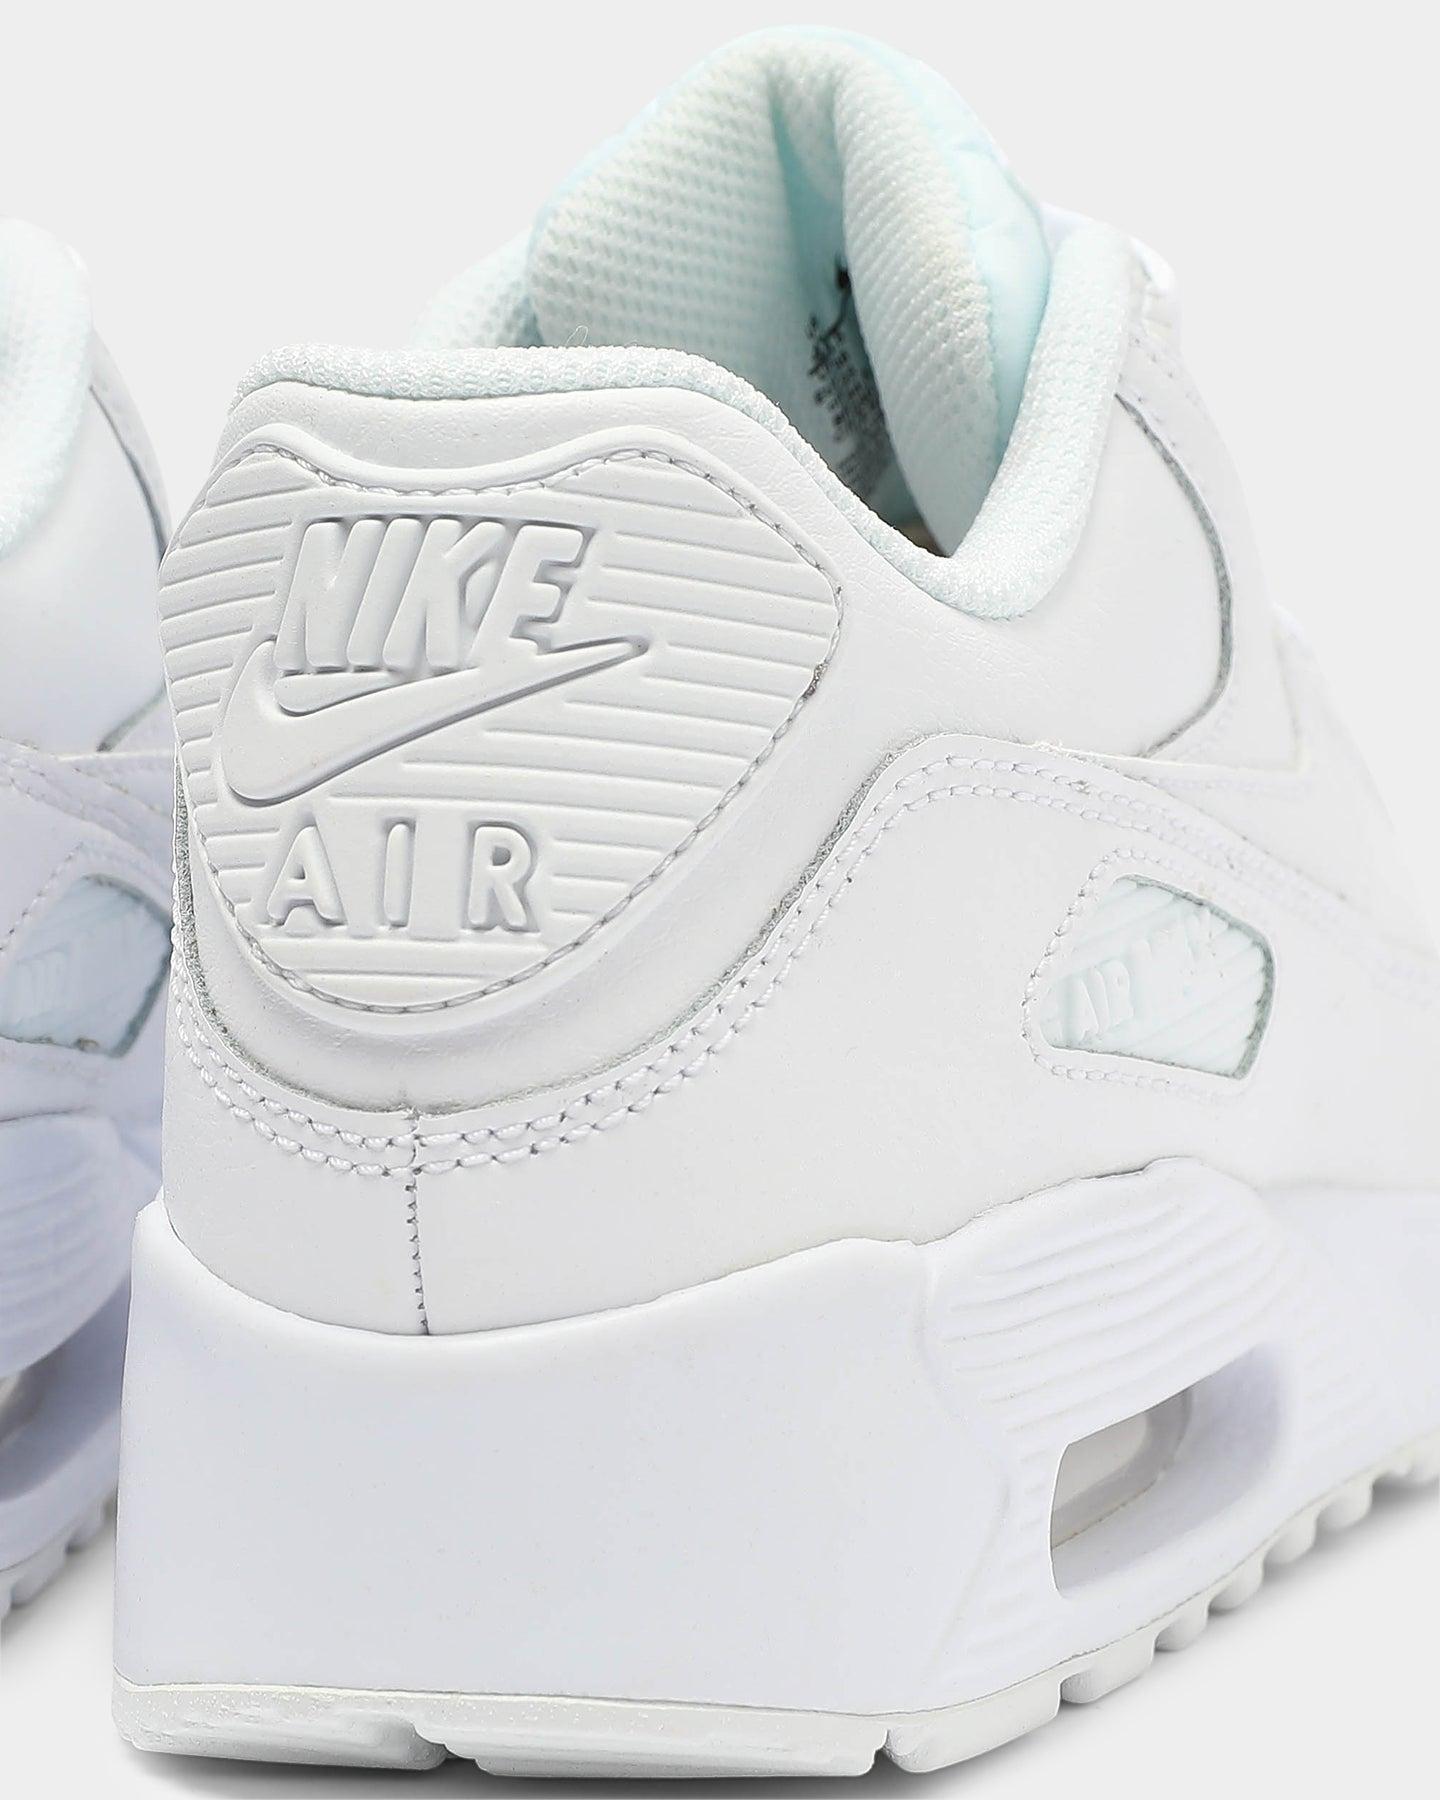 Sneakers Nike, AM270 React, hot drop sur Zalando ! | Black